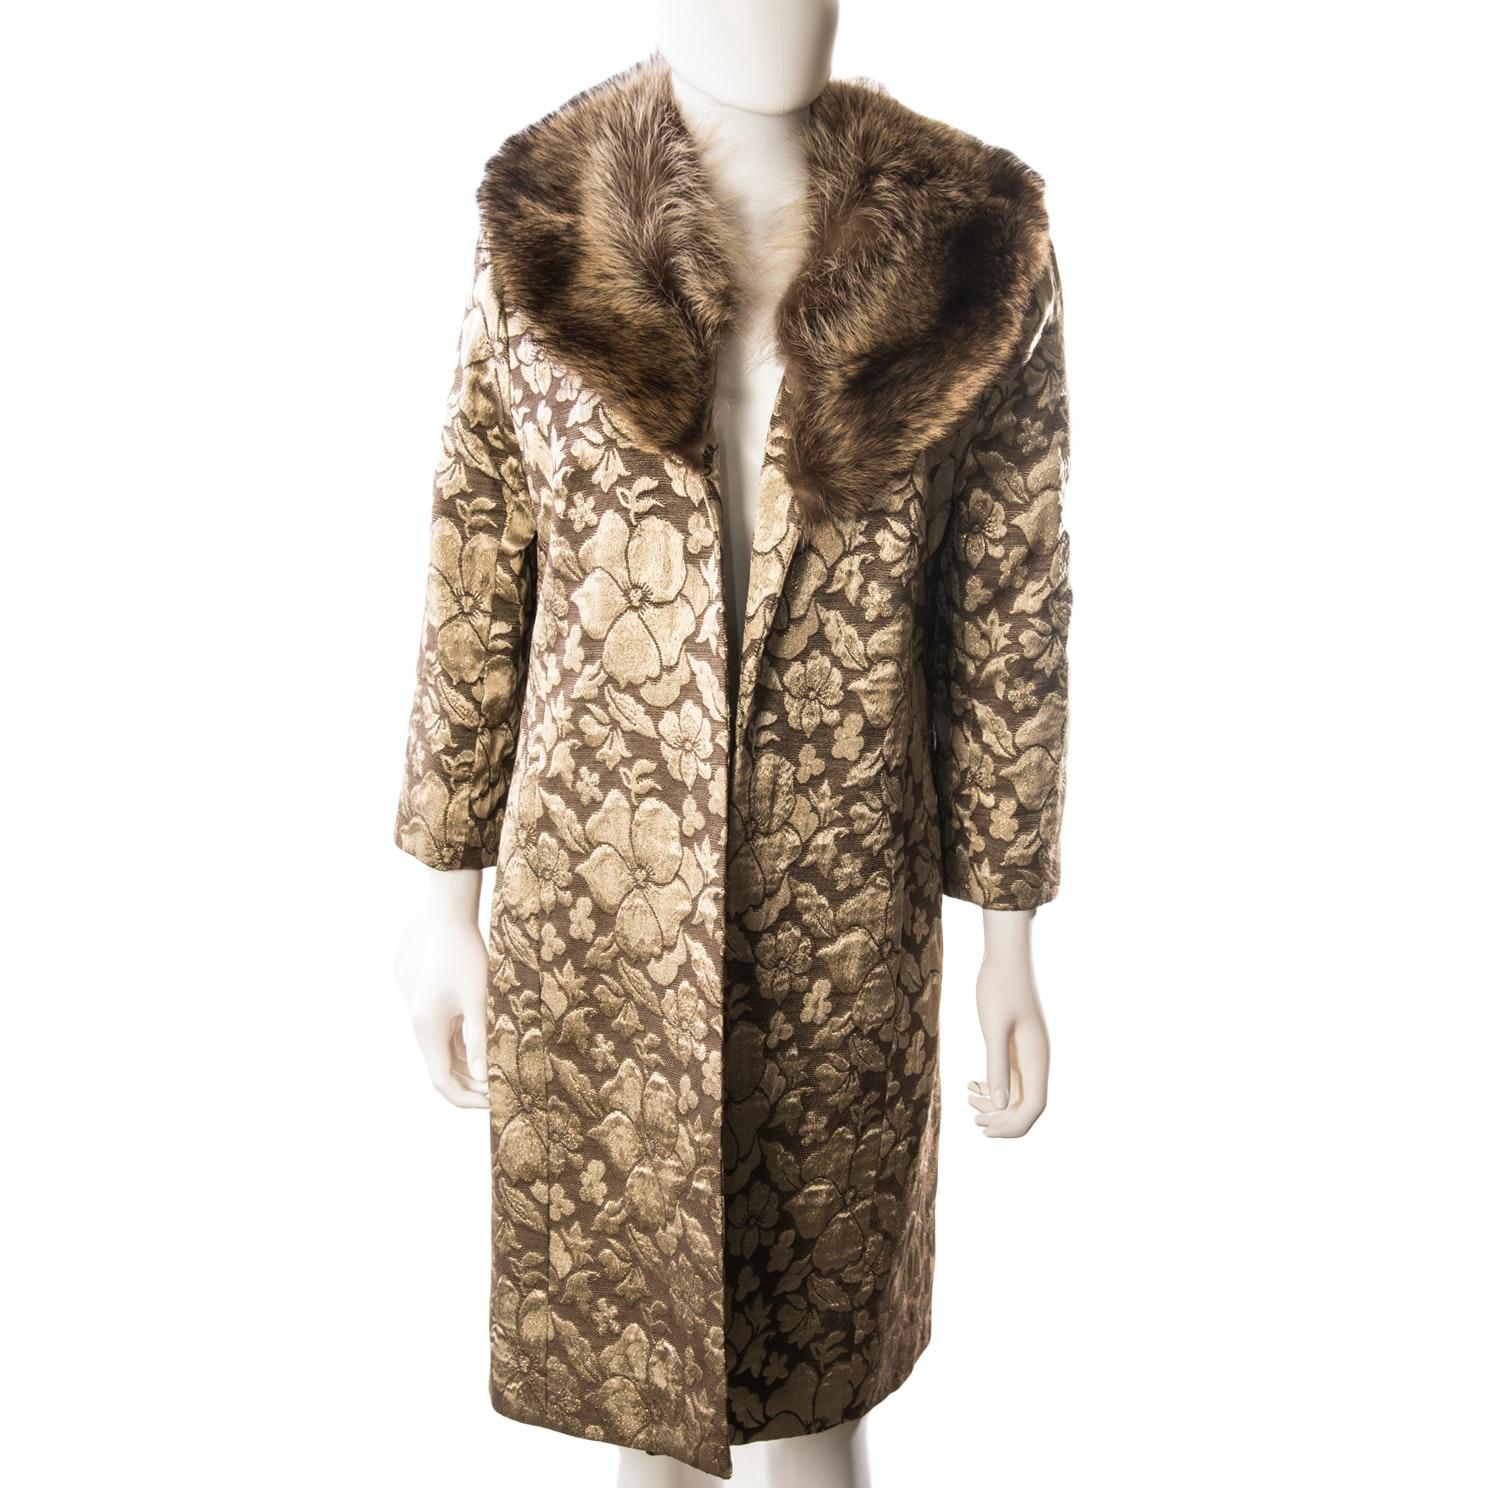 Bloomingdales Brocade Jacket with Raccoon Fur Collar